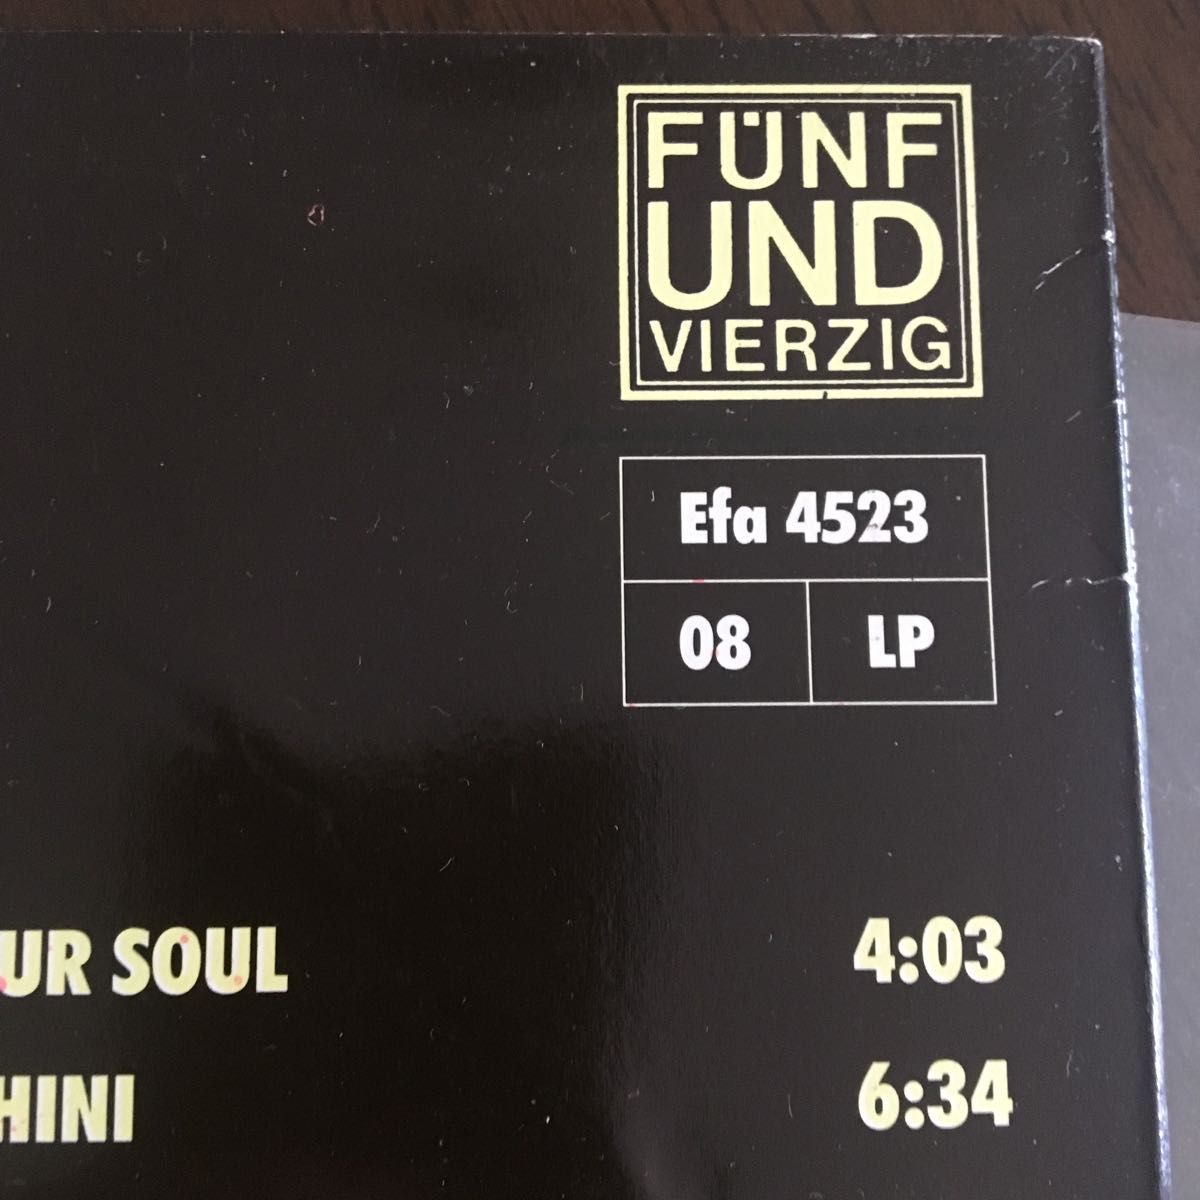 Dunkelziffer / III /LPレコード Krautroc 美品 ダモ鈴木 CAN_画像3